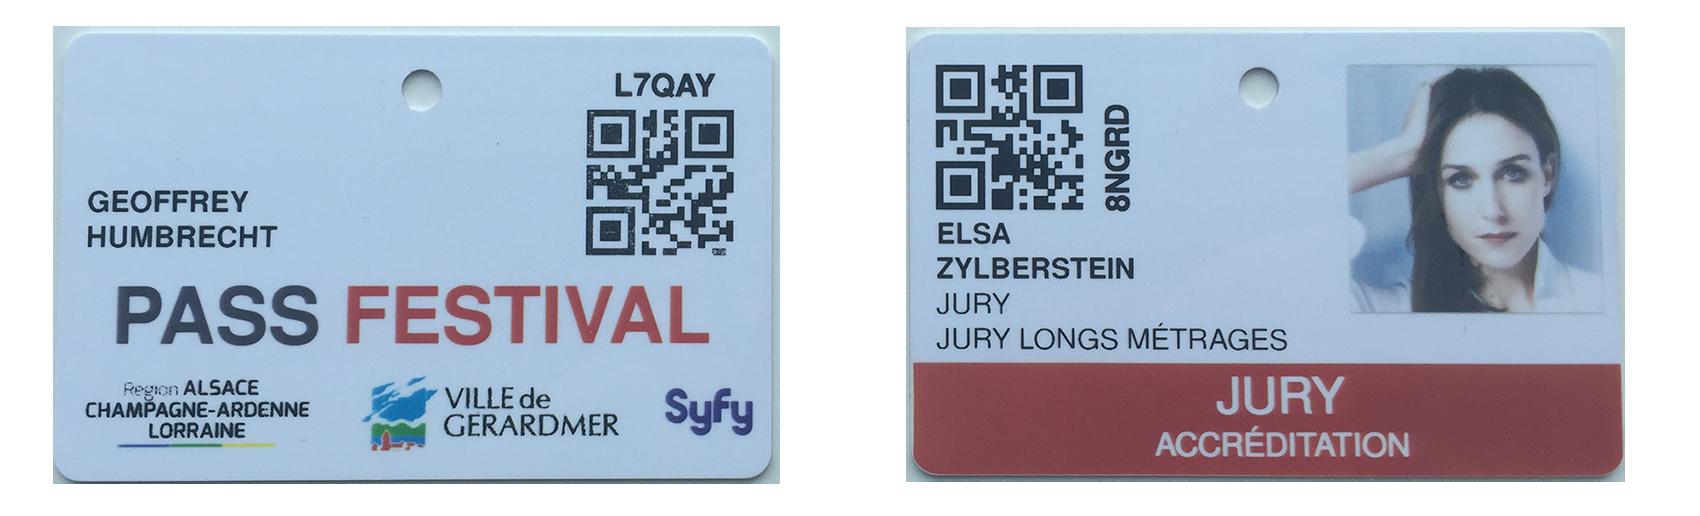 Badge QR code festival Gérardmer